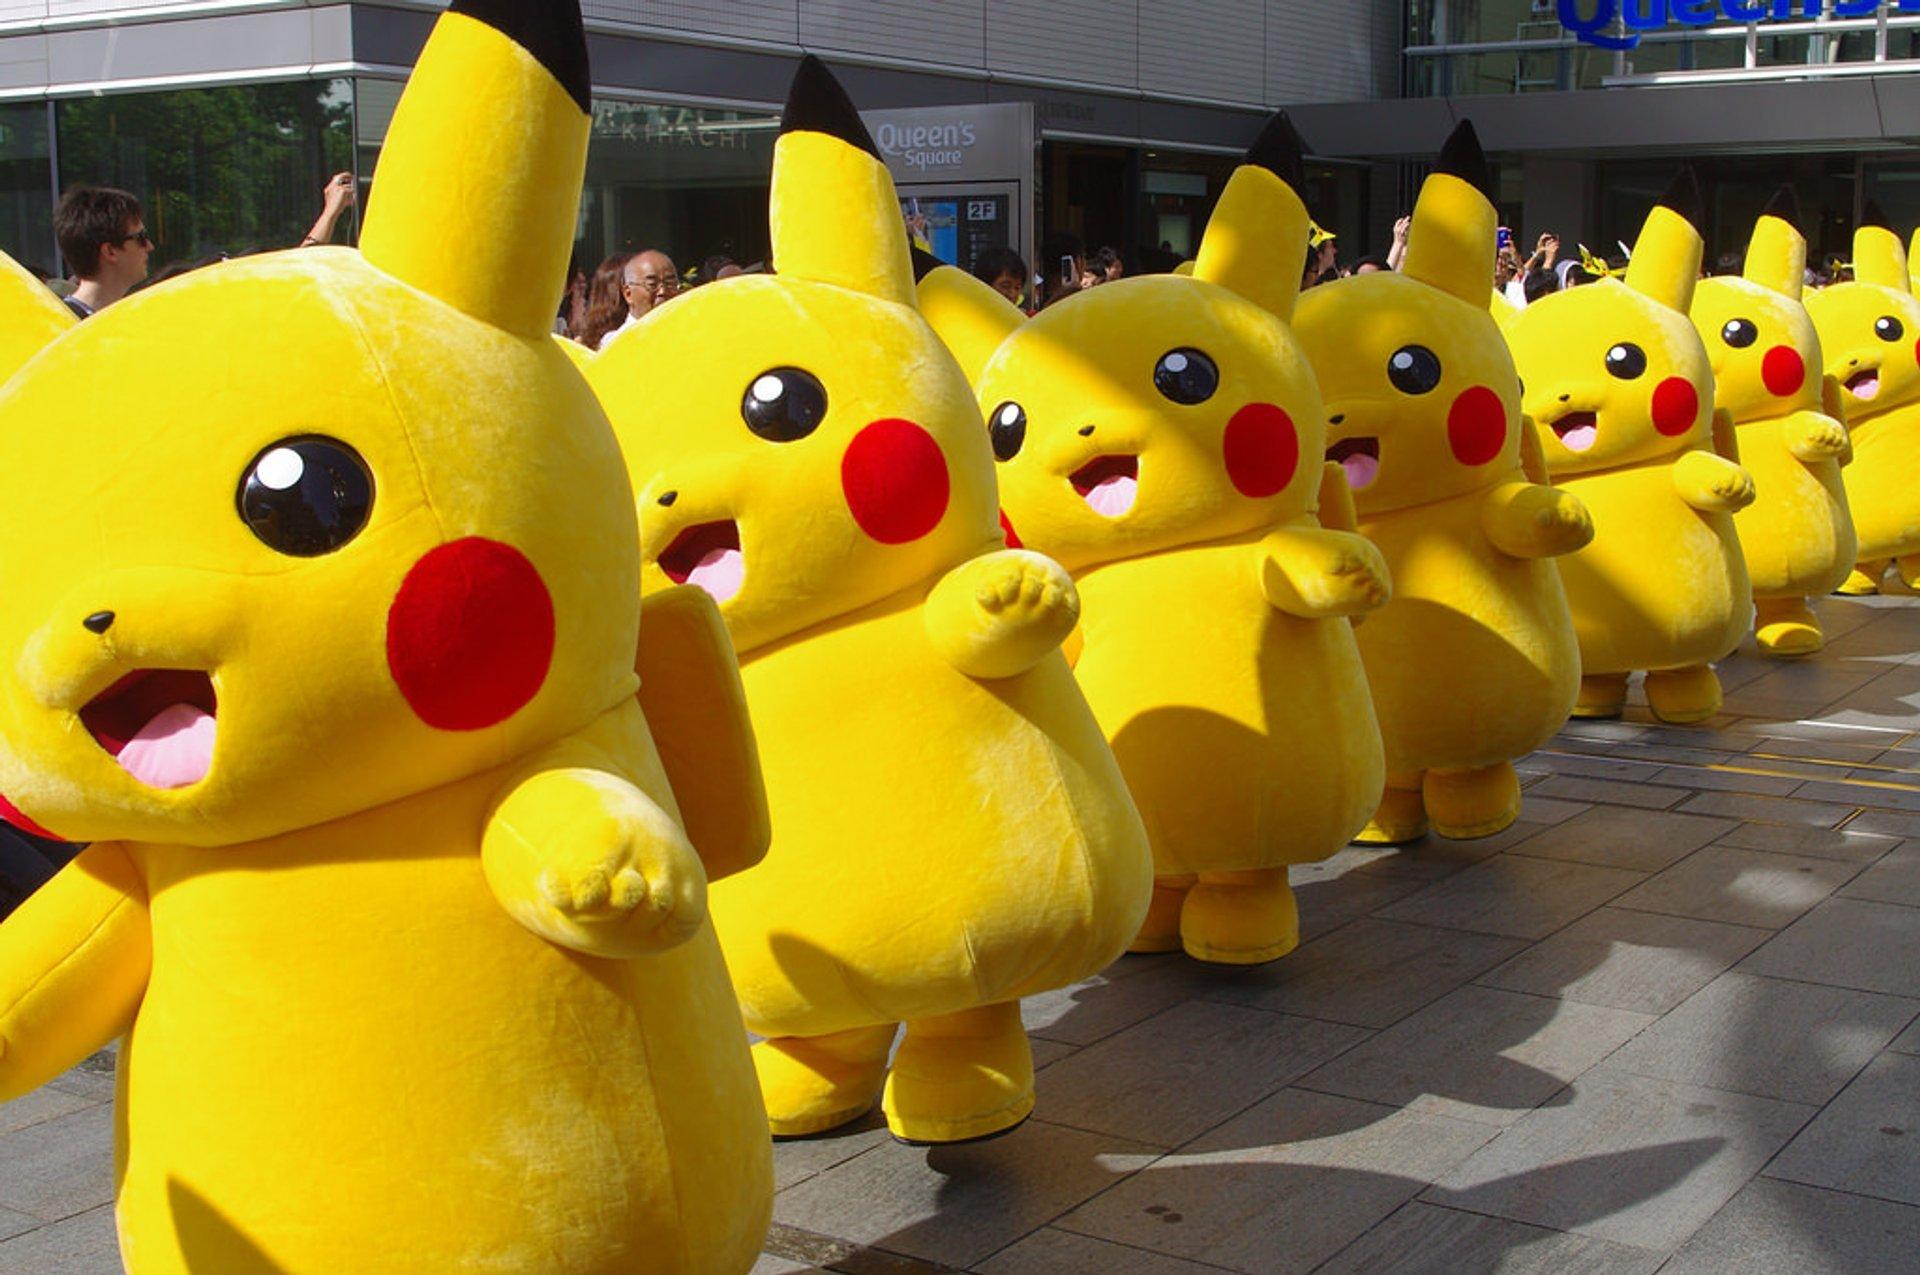 Pikachu Tairyou Hassei-Chu in Japan 2019 - Best Time